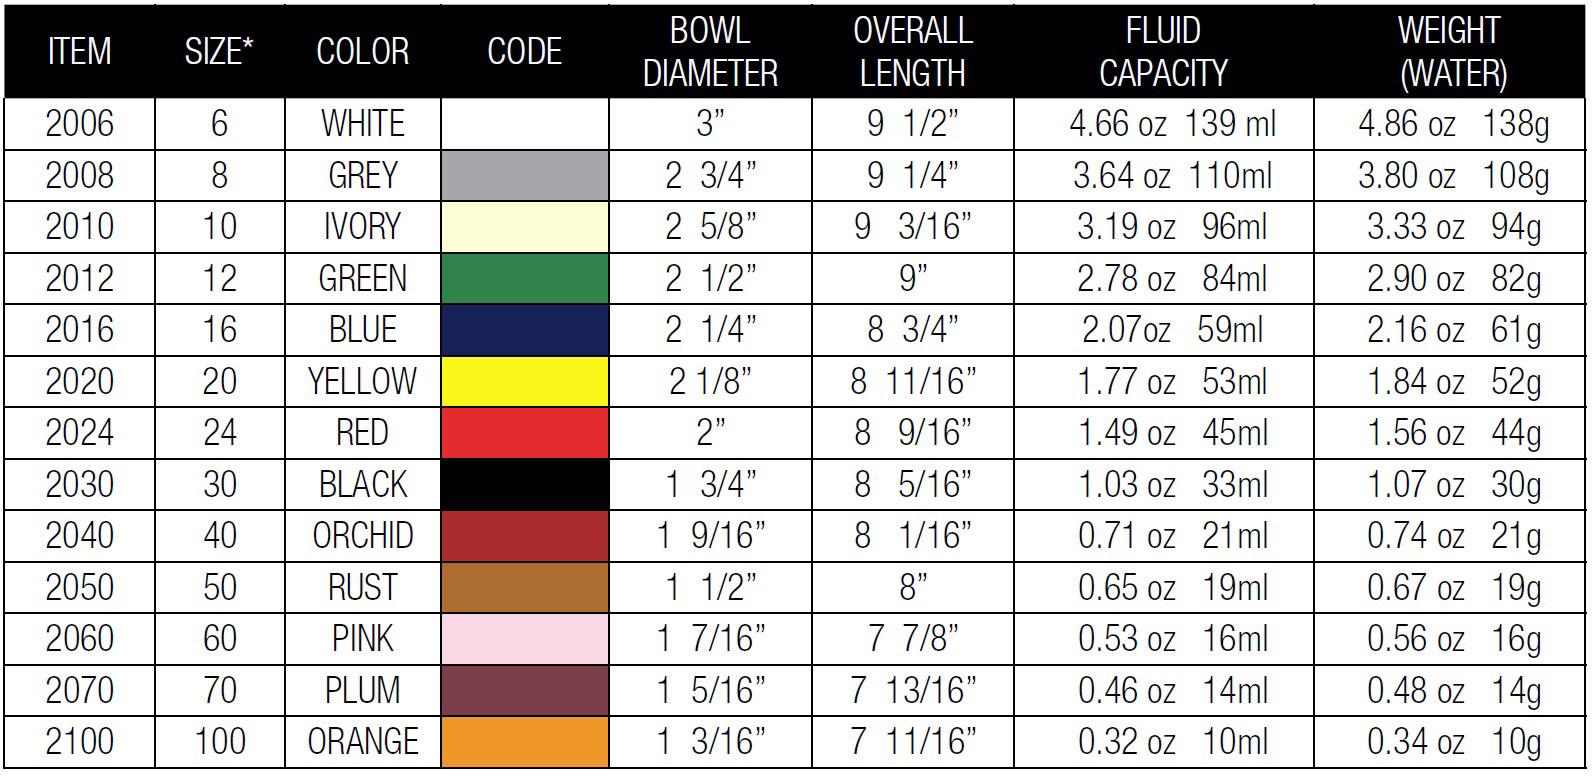 zeroll-universal-ez-dishers-chart2.jpg